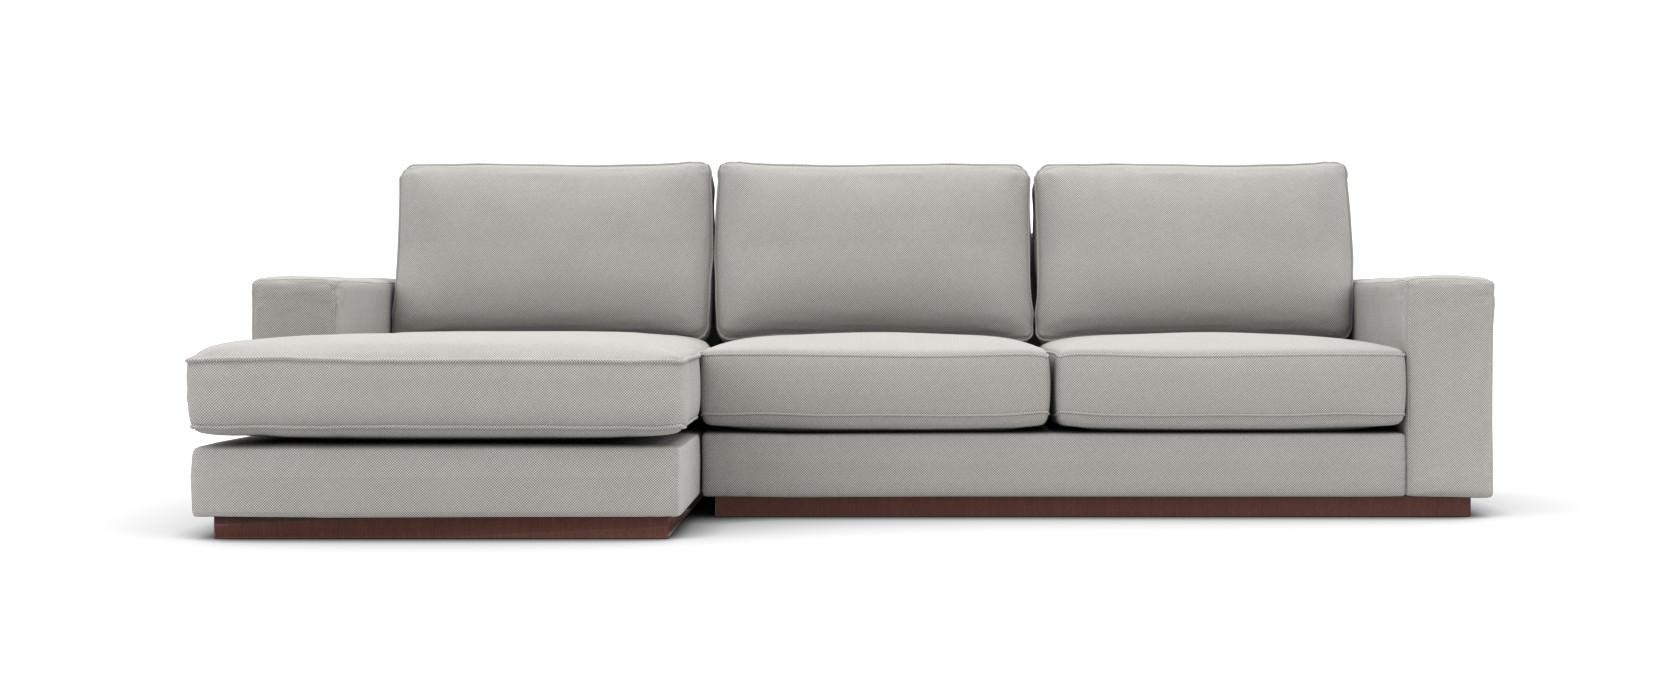 Sofa mit Chaiselongue Milano Lounge